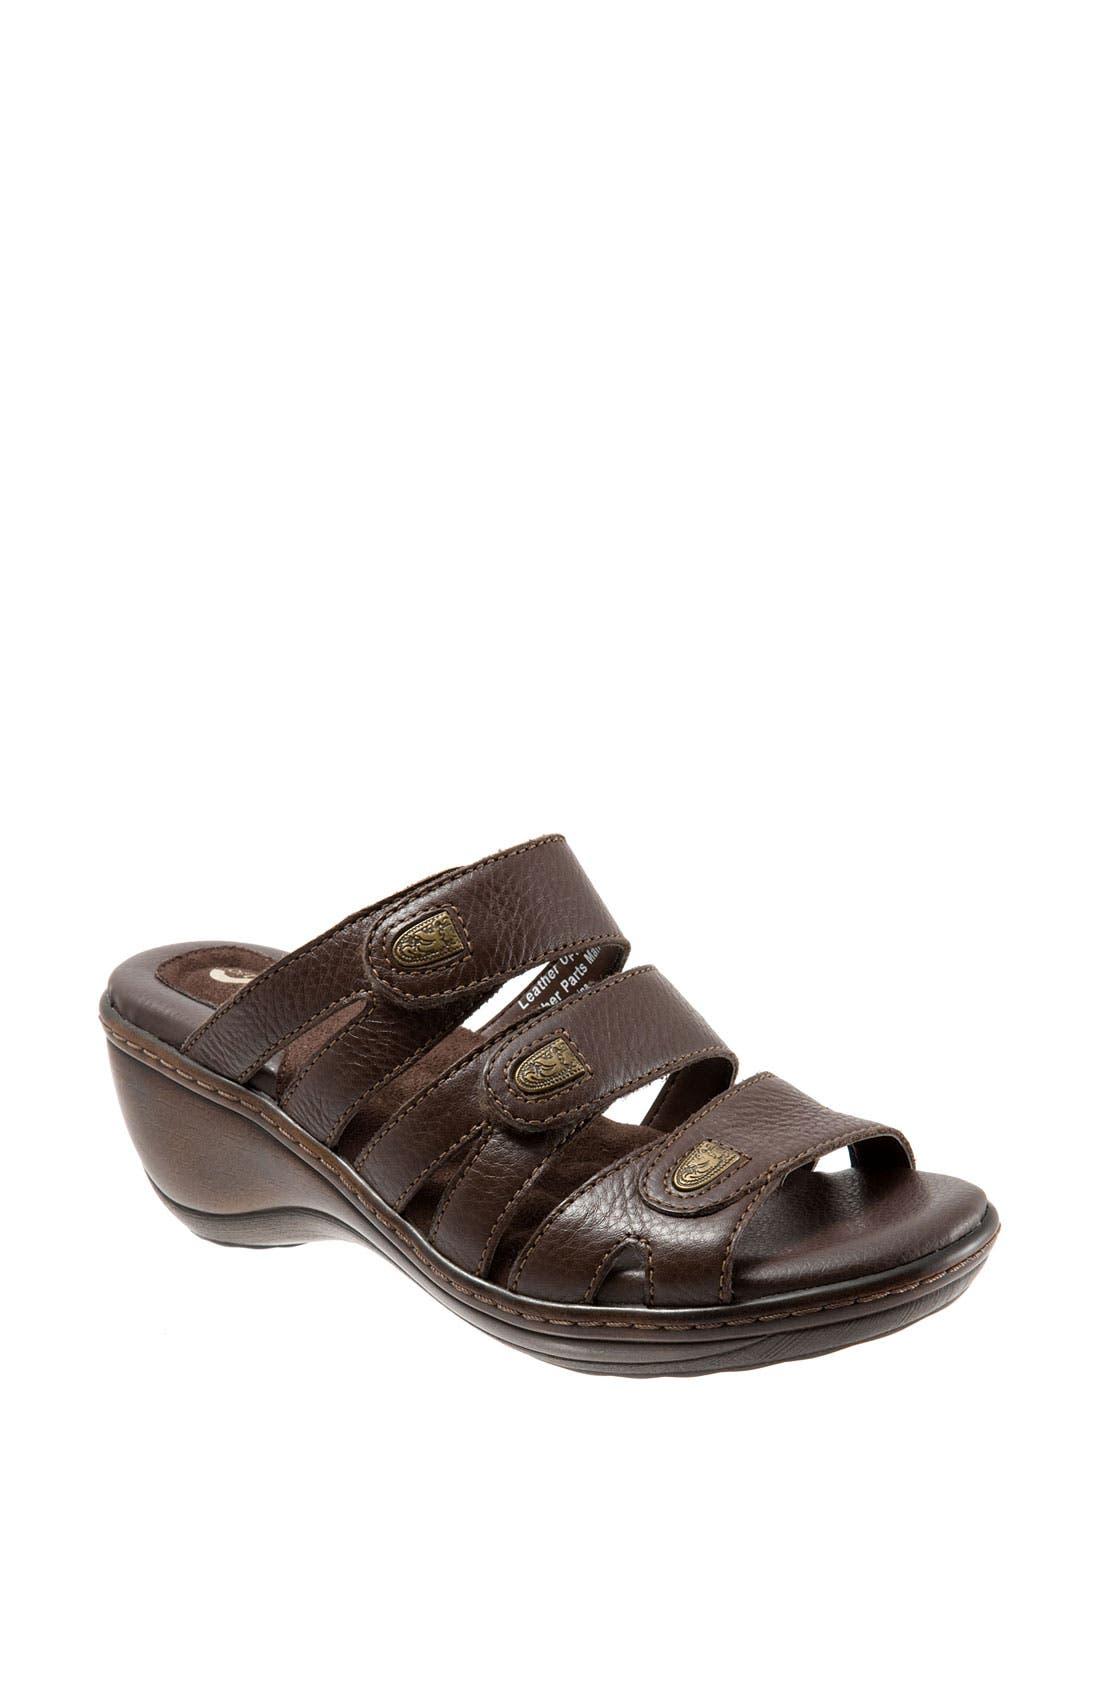 Alternate Image 1 Selected - SoftWalk® 'Macon' Sandal